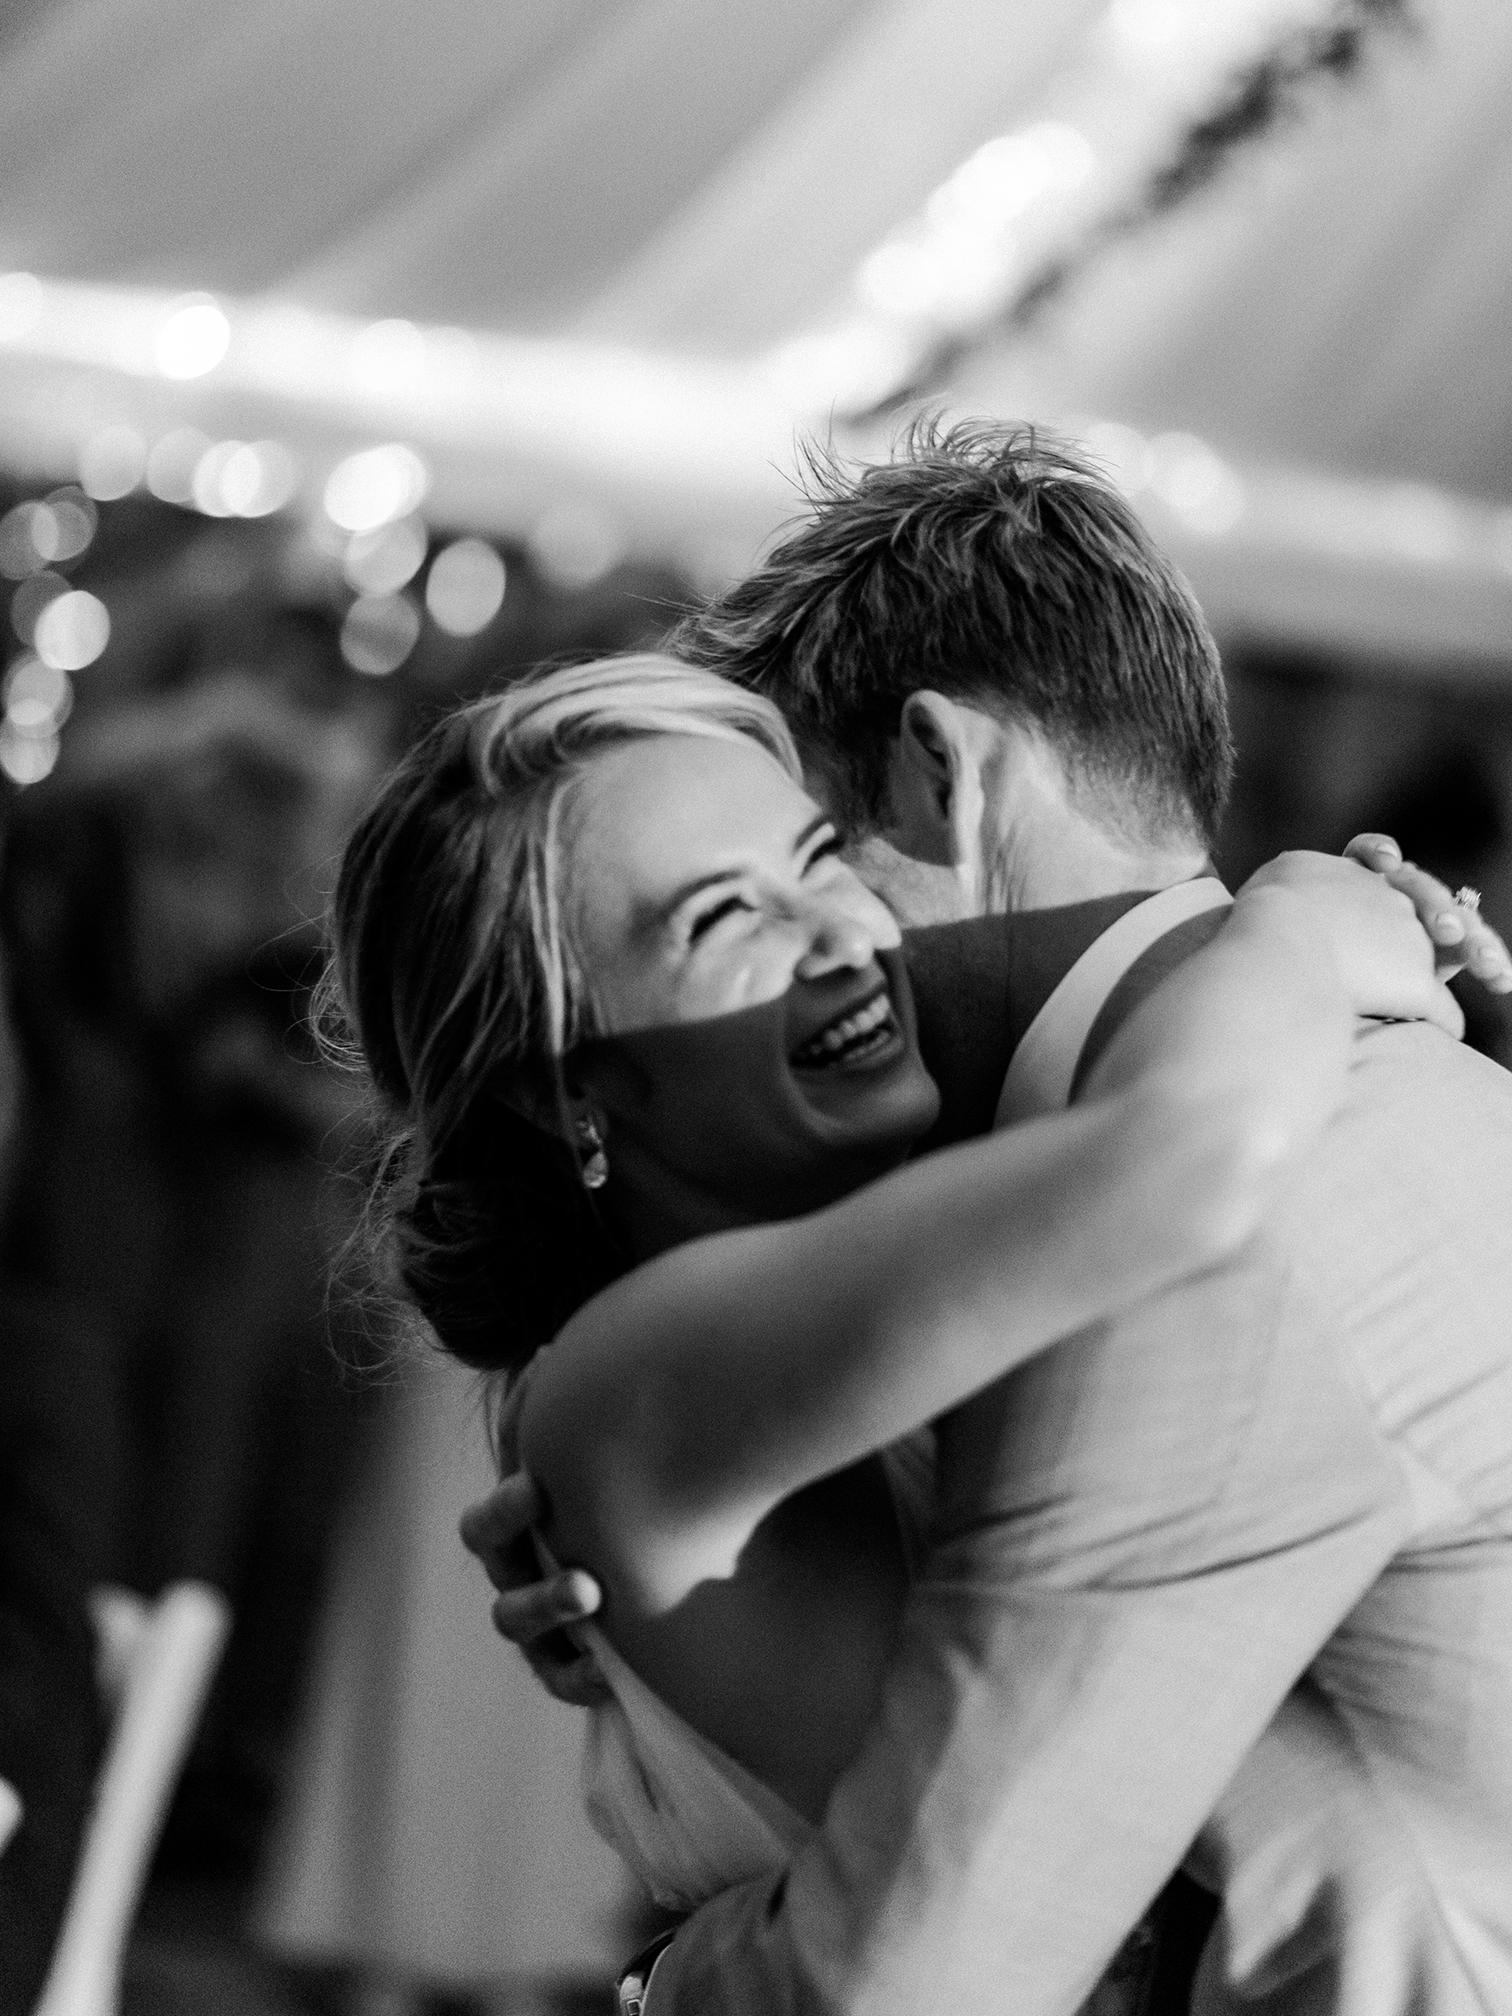 Wedding Photographers Colorado, Best Creative Wedding Photographers in Colorado, Bride Laughing During Dances, Black and White Wedding Photos